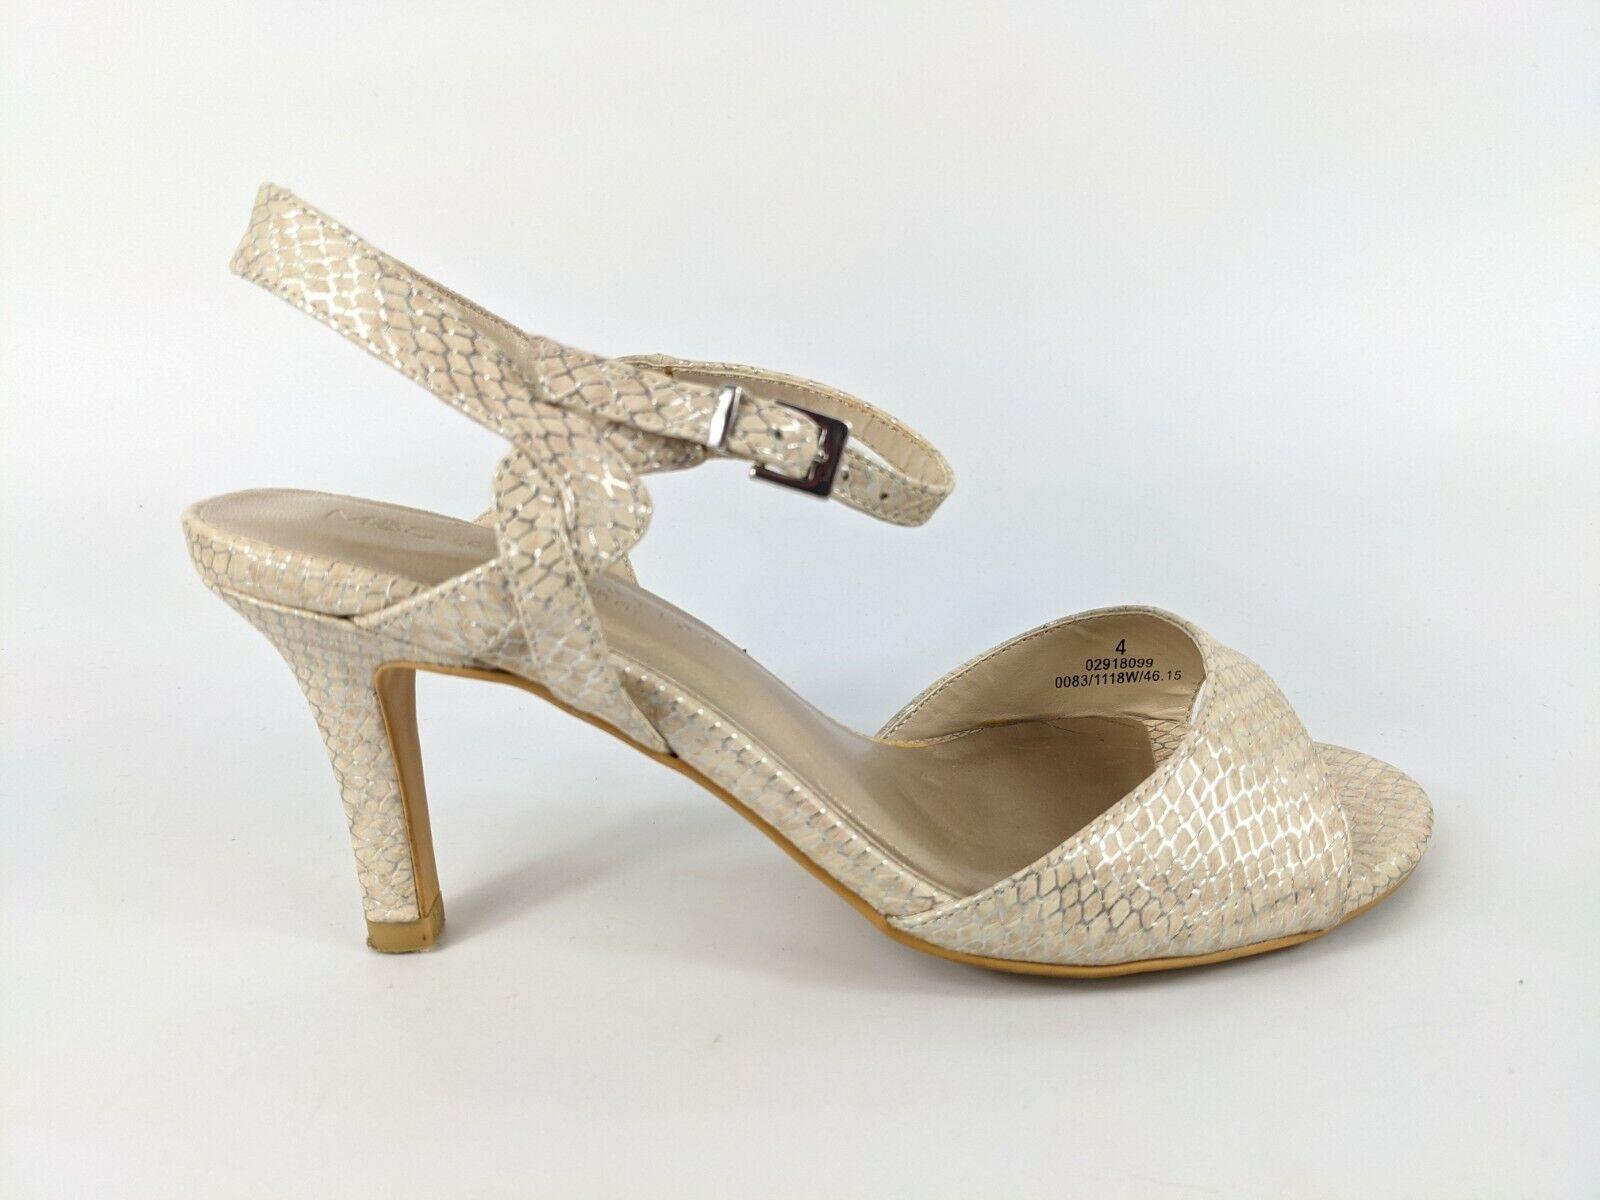 M & S Collection Snakeprint High Heel Sandals Uk 4 wide